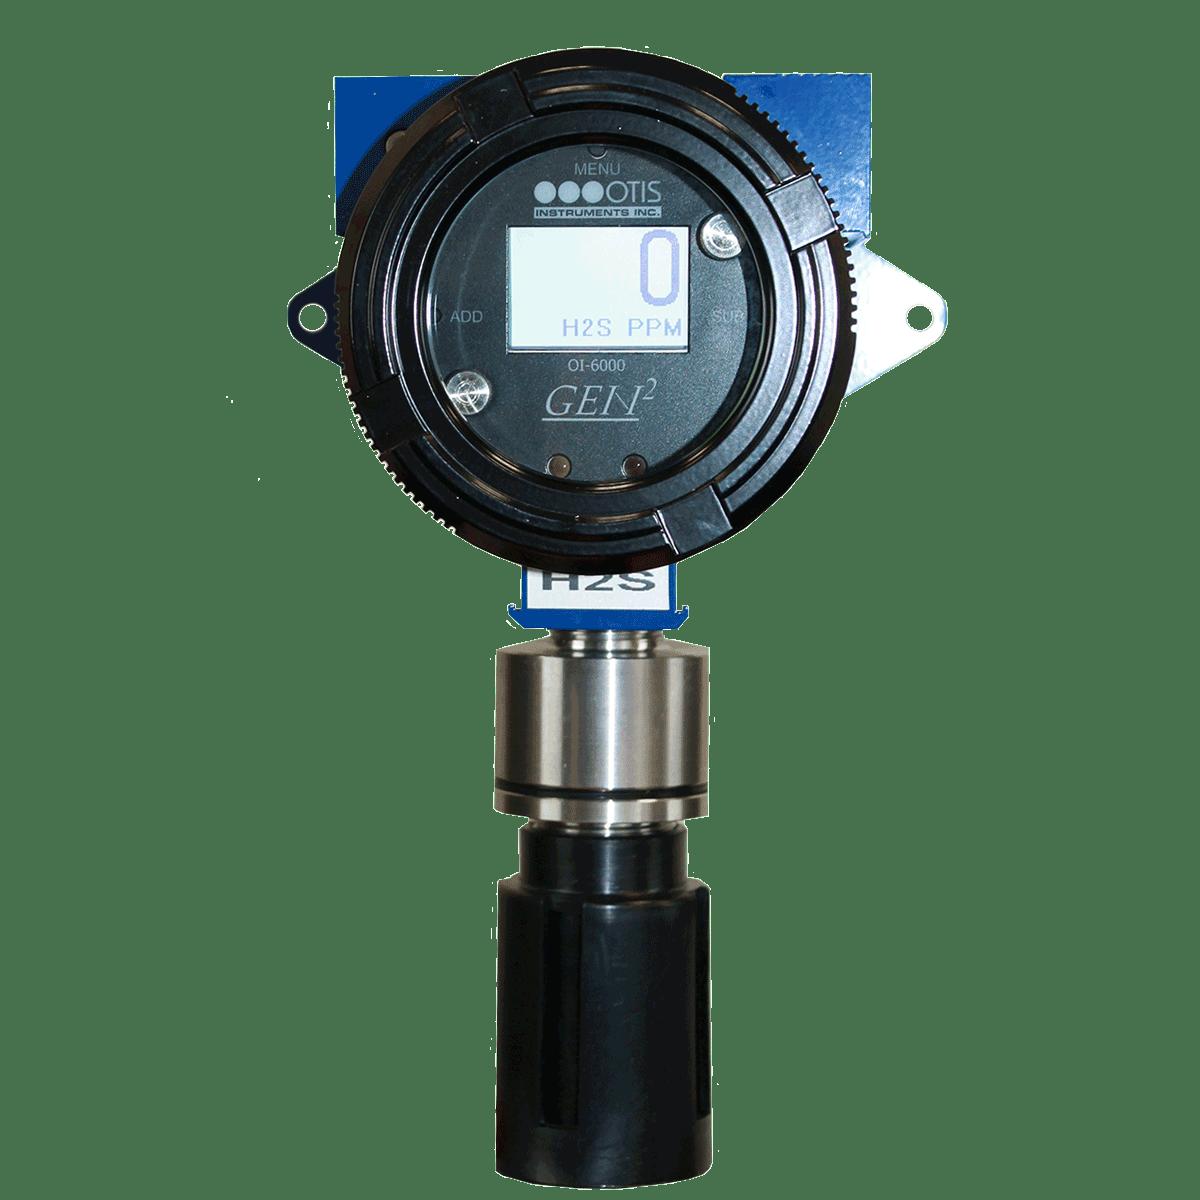 OI-6000-Sensor-Assembly---Otis-Instruments